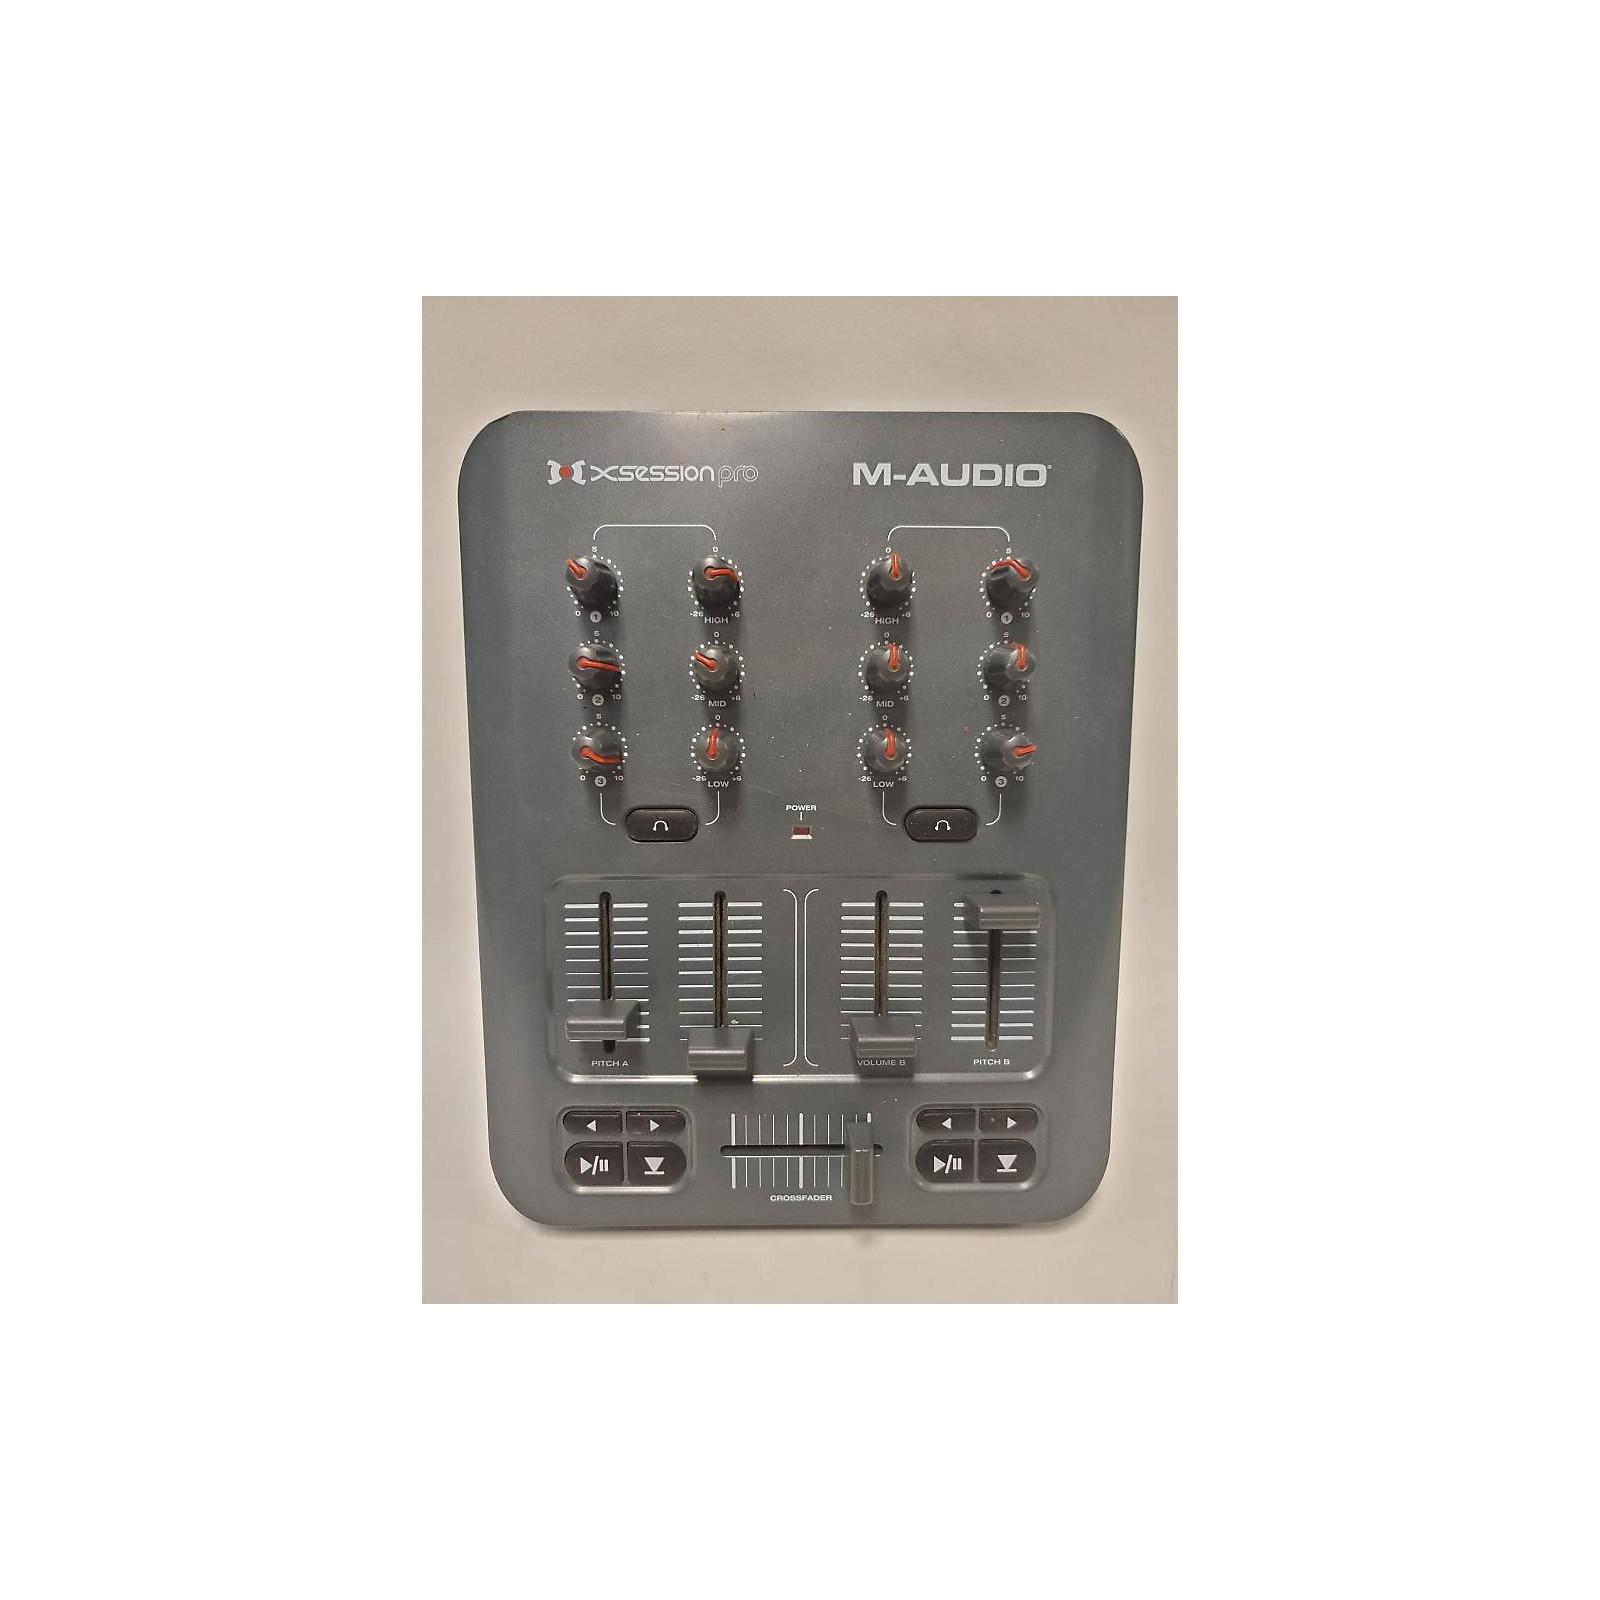 M-Audio Xsession Pro DJ Mixer